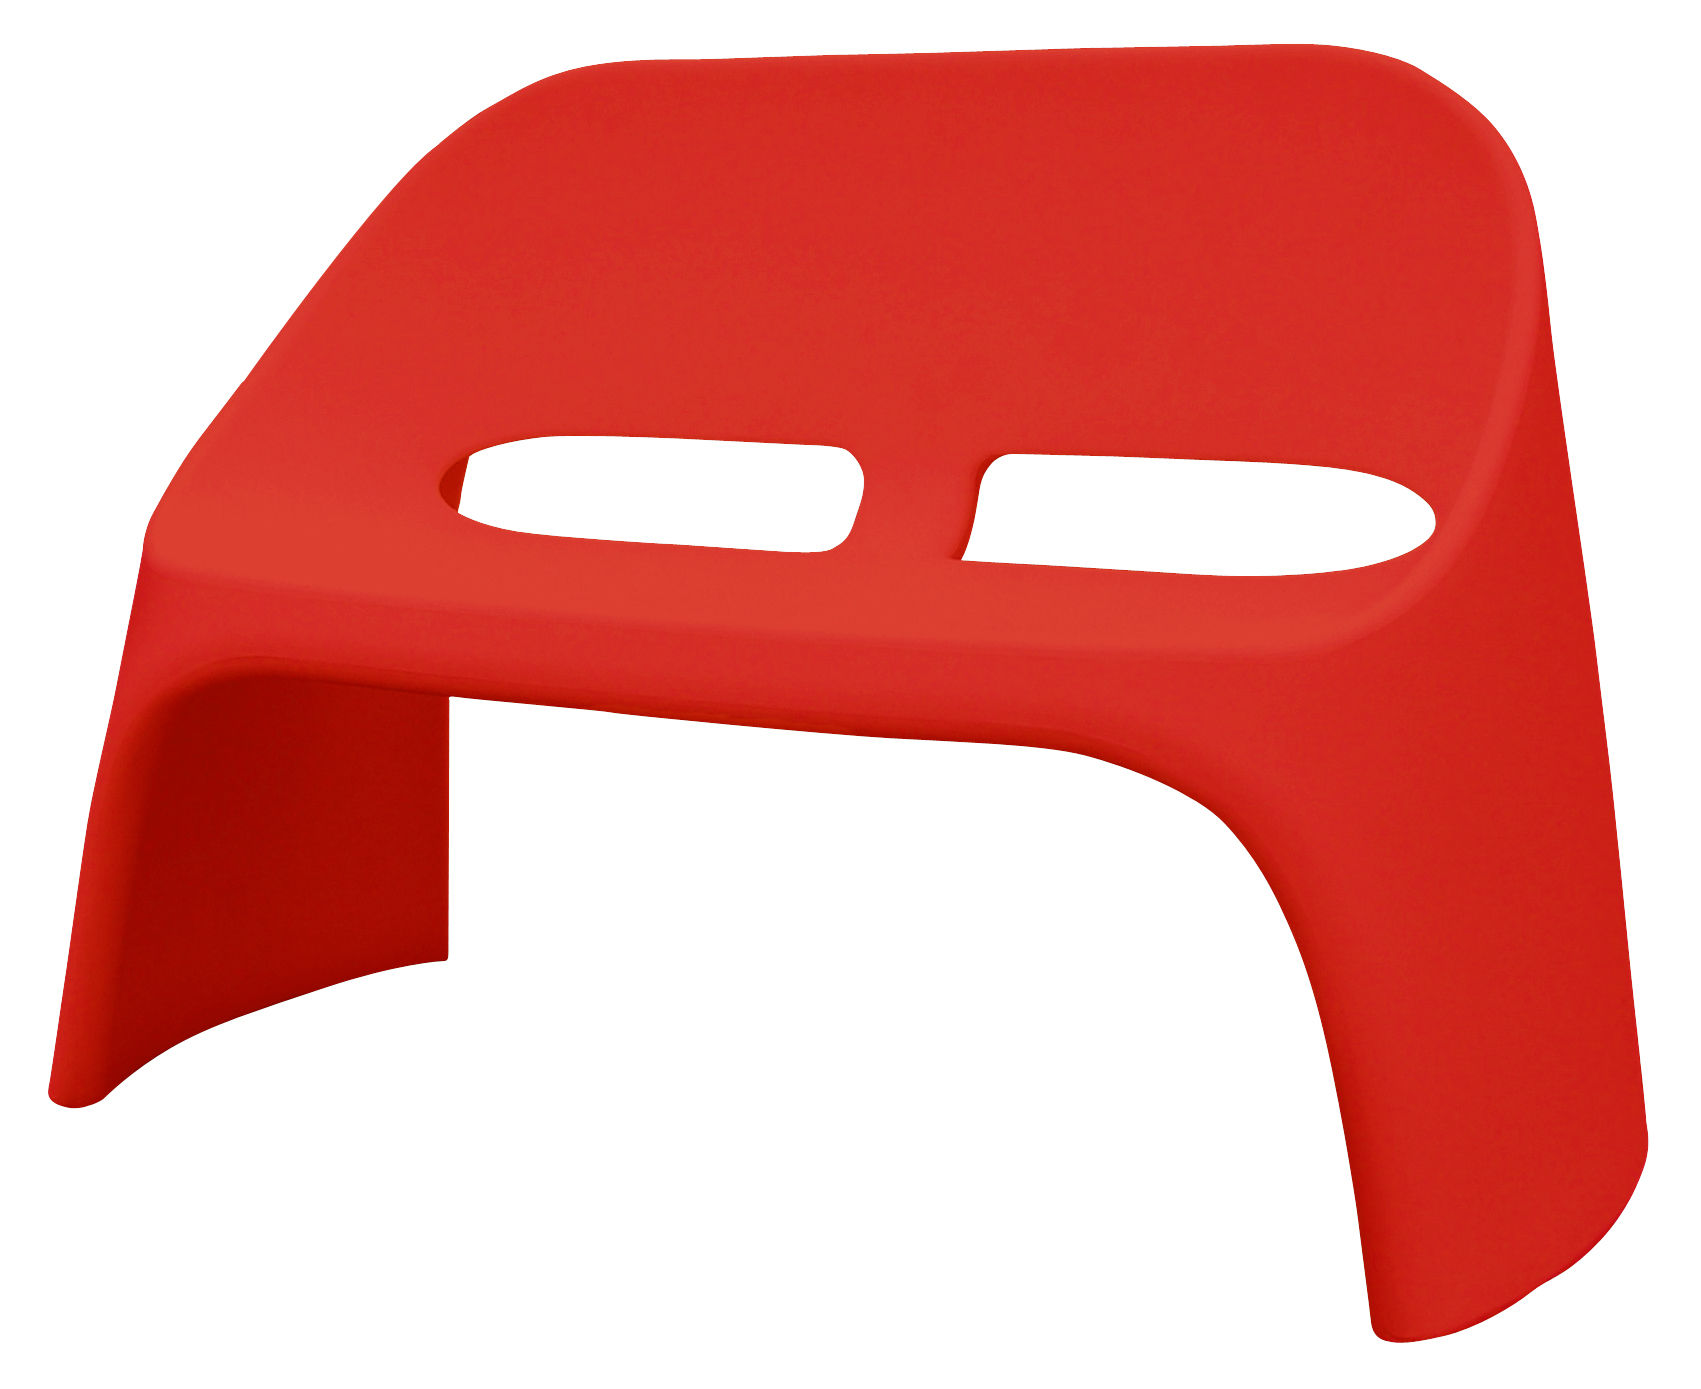 Möbel - Bänke - Amélie Bank mit Rückenlehne 2-Sitzer - Slide - Rot - recycelbares Polyethen